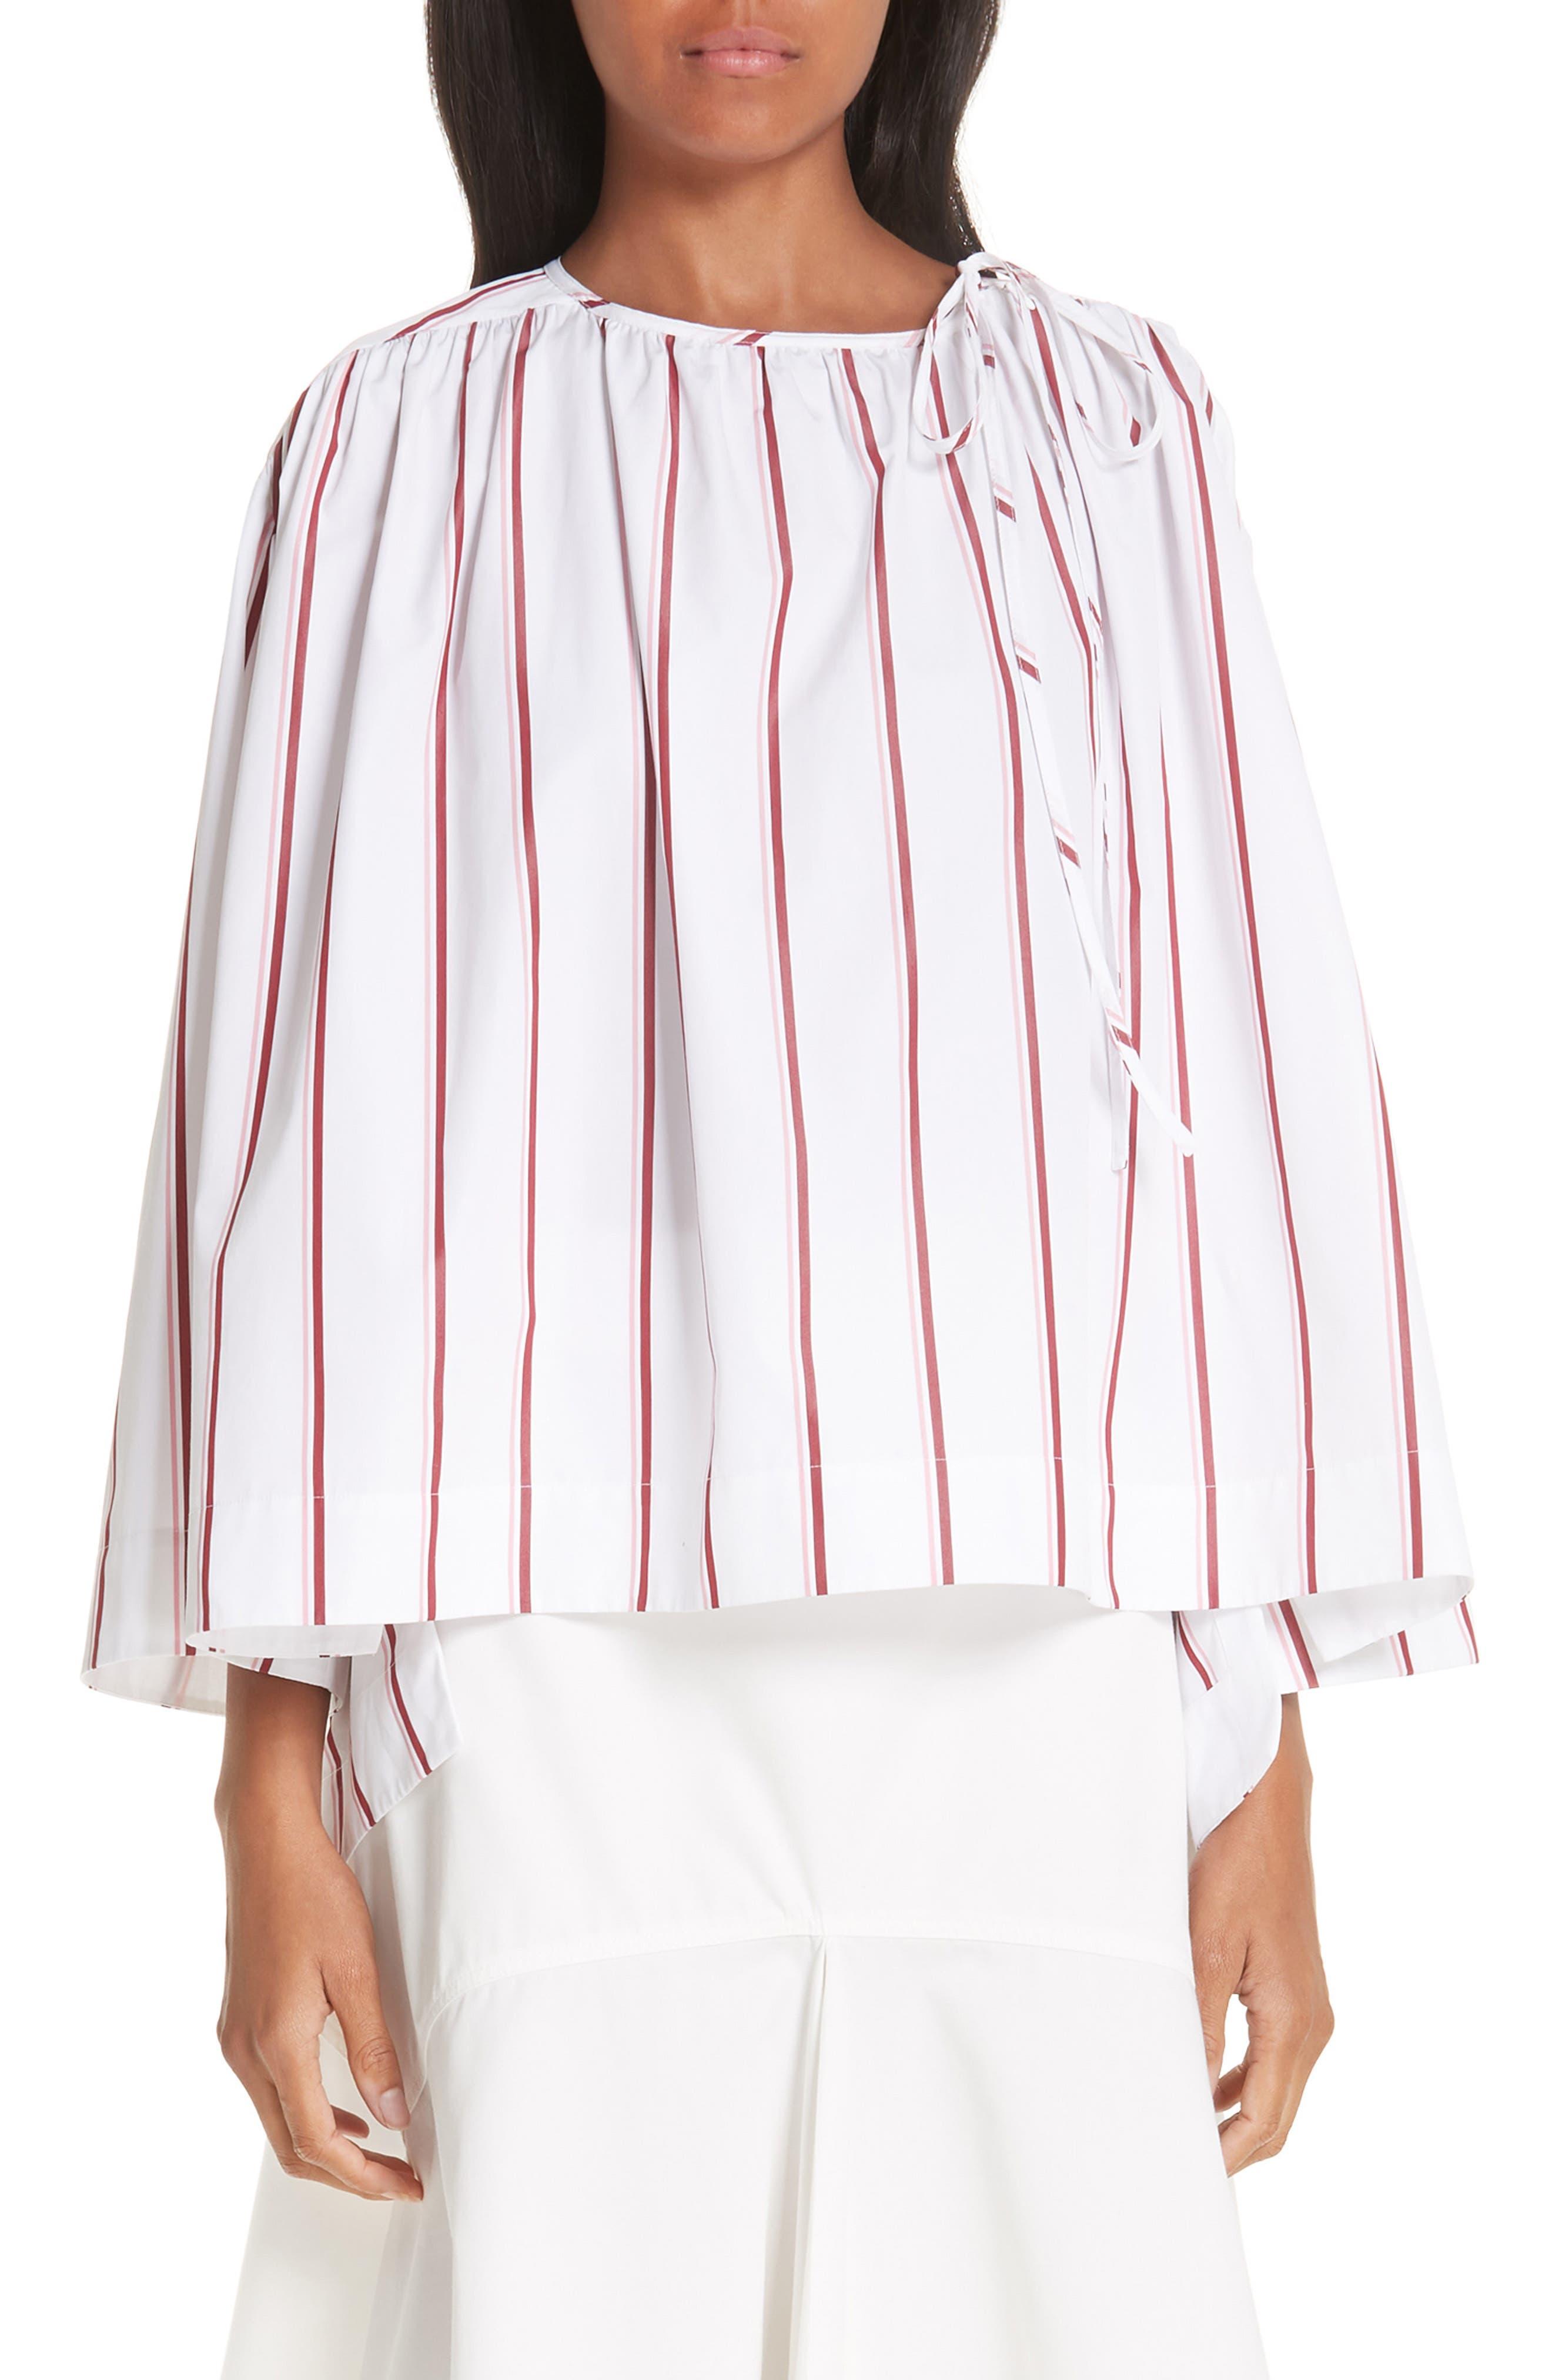 CALVIN KLEIN 205W39NYC Tie Neck Cotton Poplin Blouse, Main, color, OPTIC WHITE CAMEO PINK